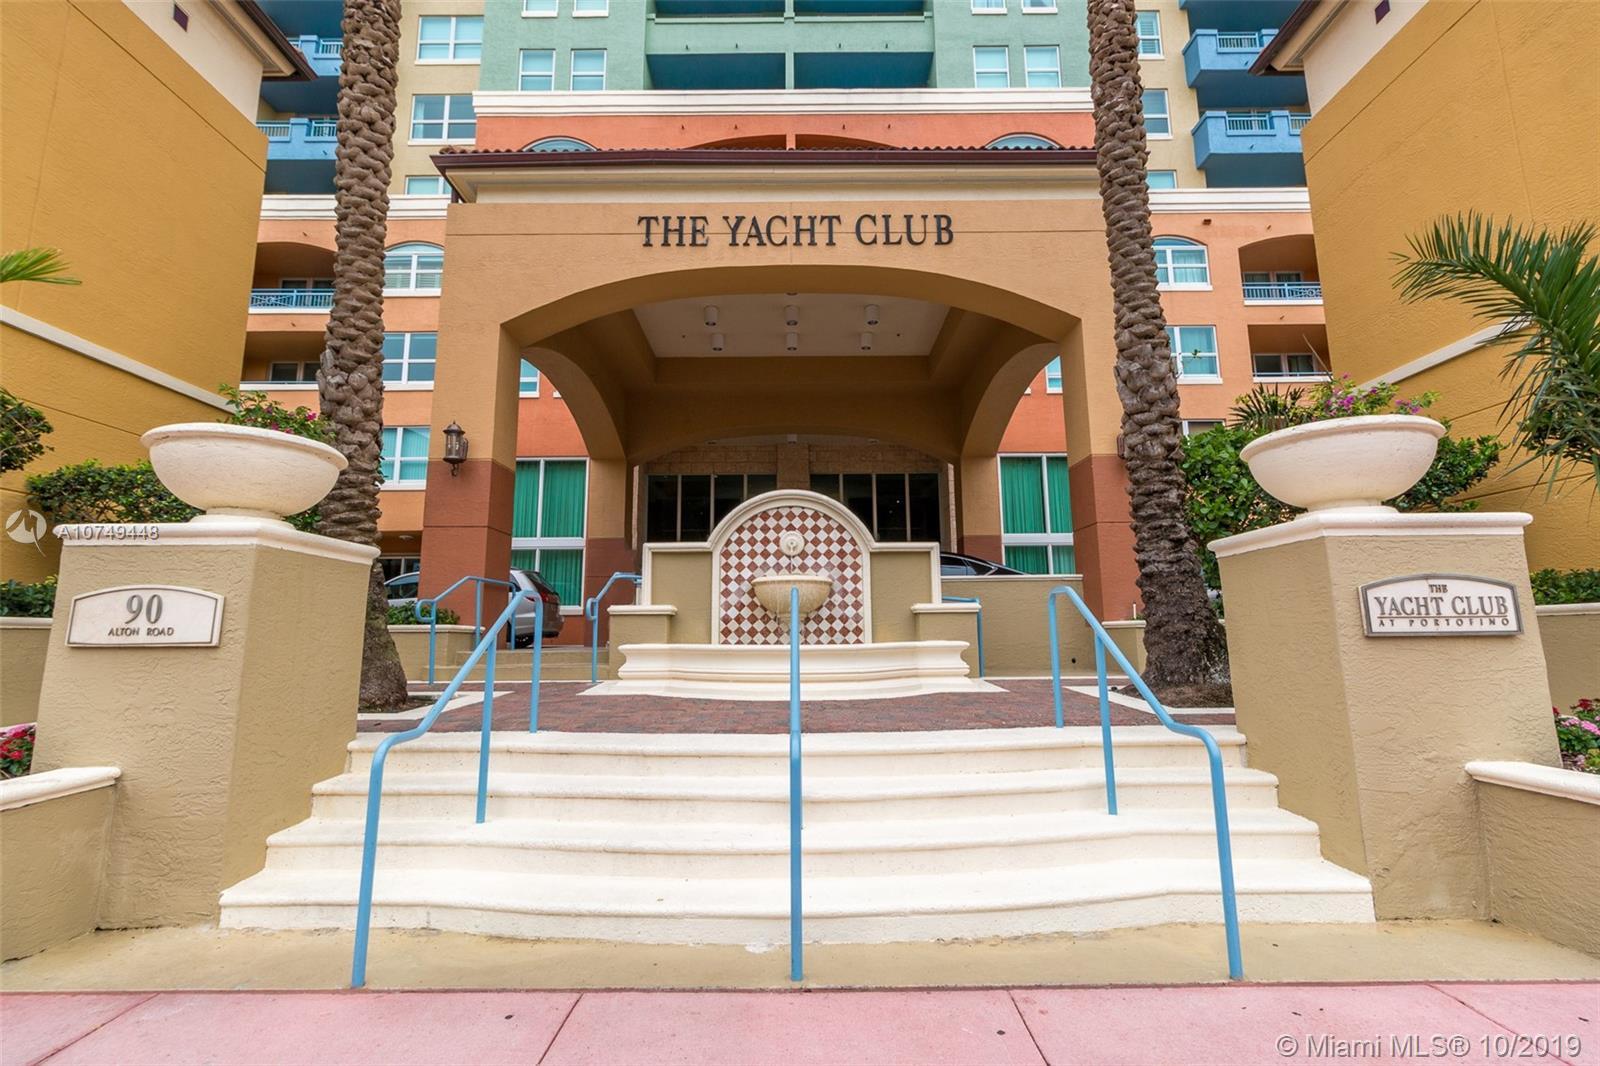 Photo of The Yacht Club Portofino Apt 2606